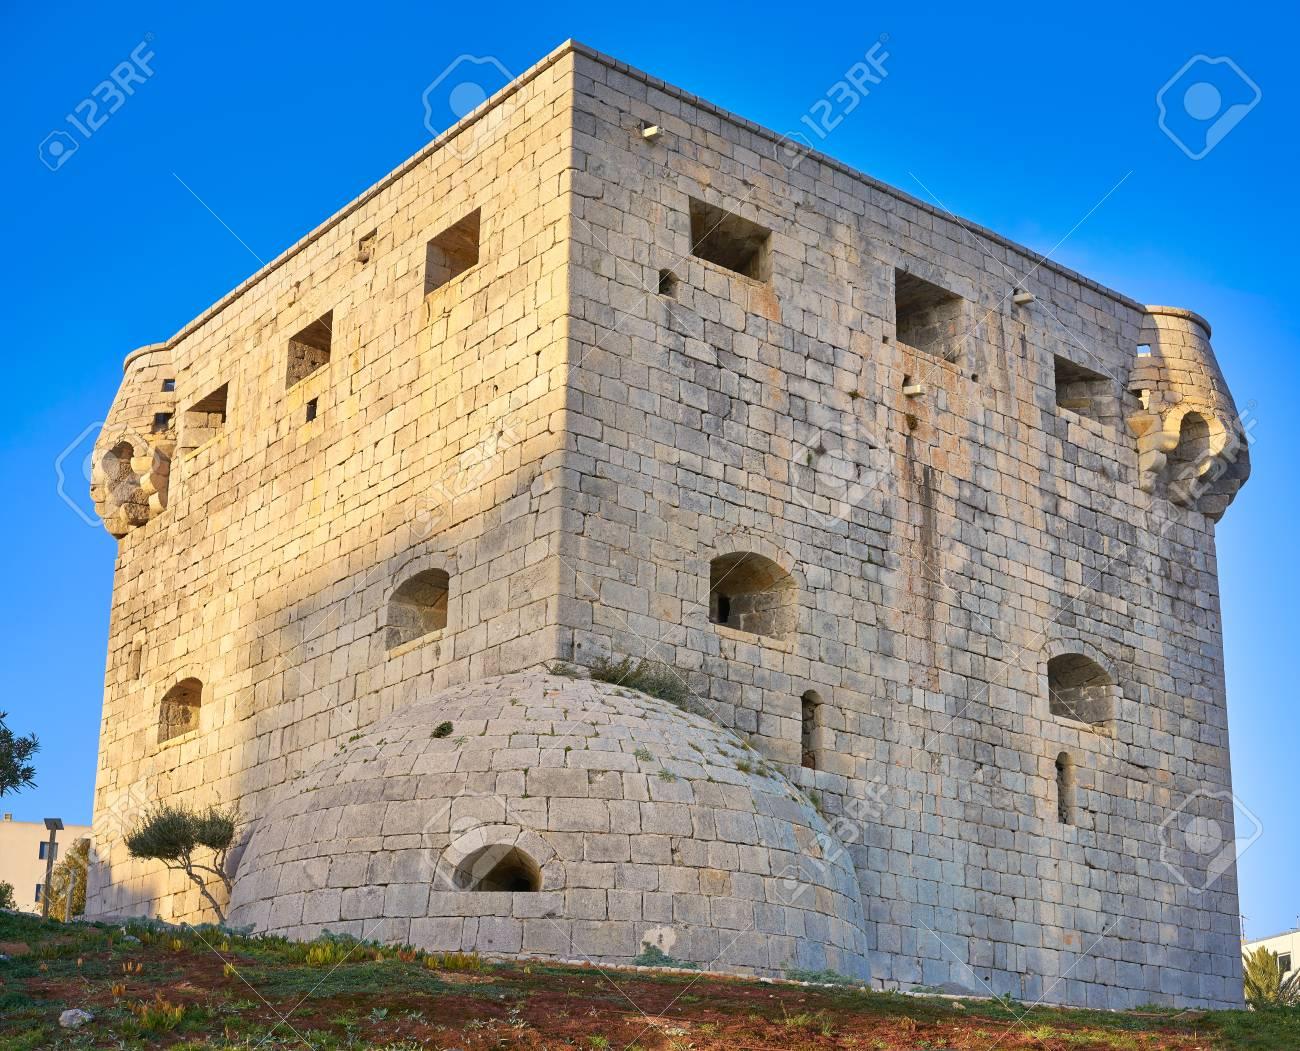 Torre Del Rey Tower At Oropesa De Mar In Castellon Spain